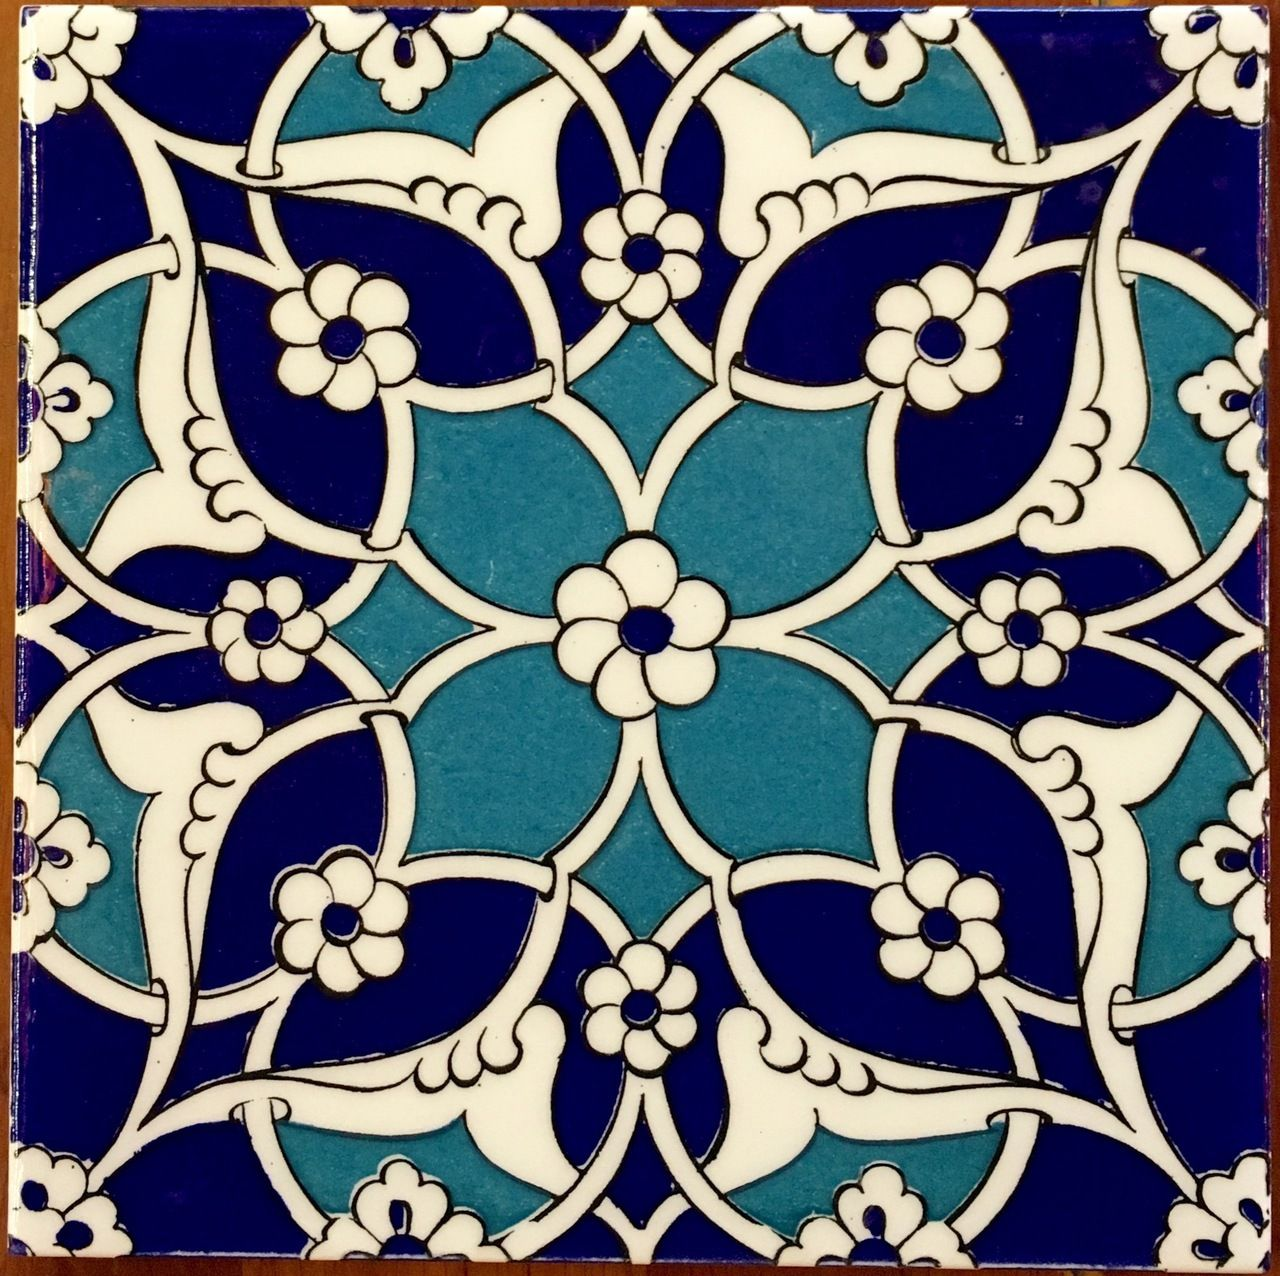 Details about hassam garden painting ceramic bathroom tile murals 2 - Ceramic Wall Tiles Afortime